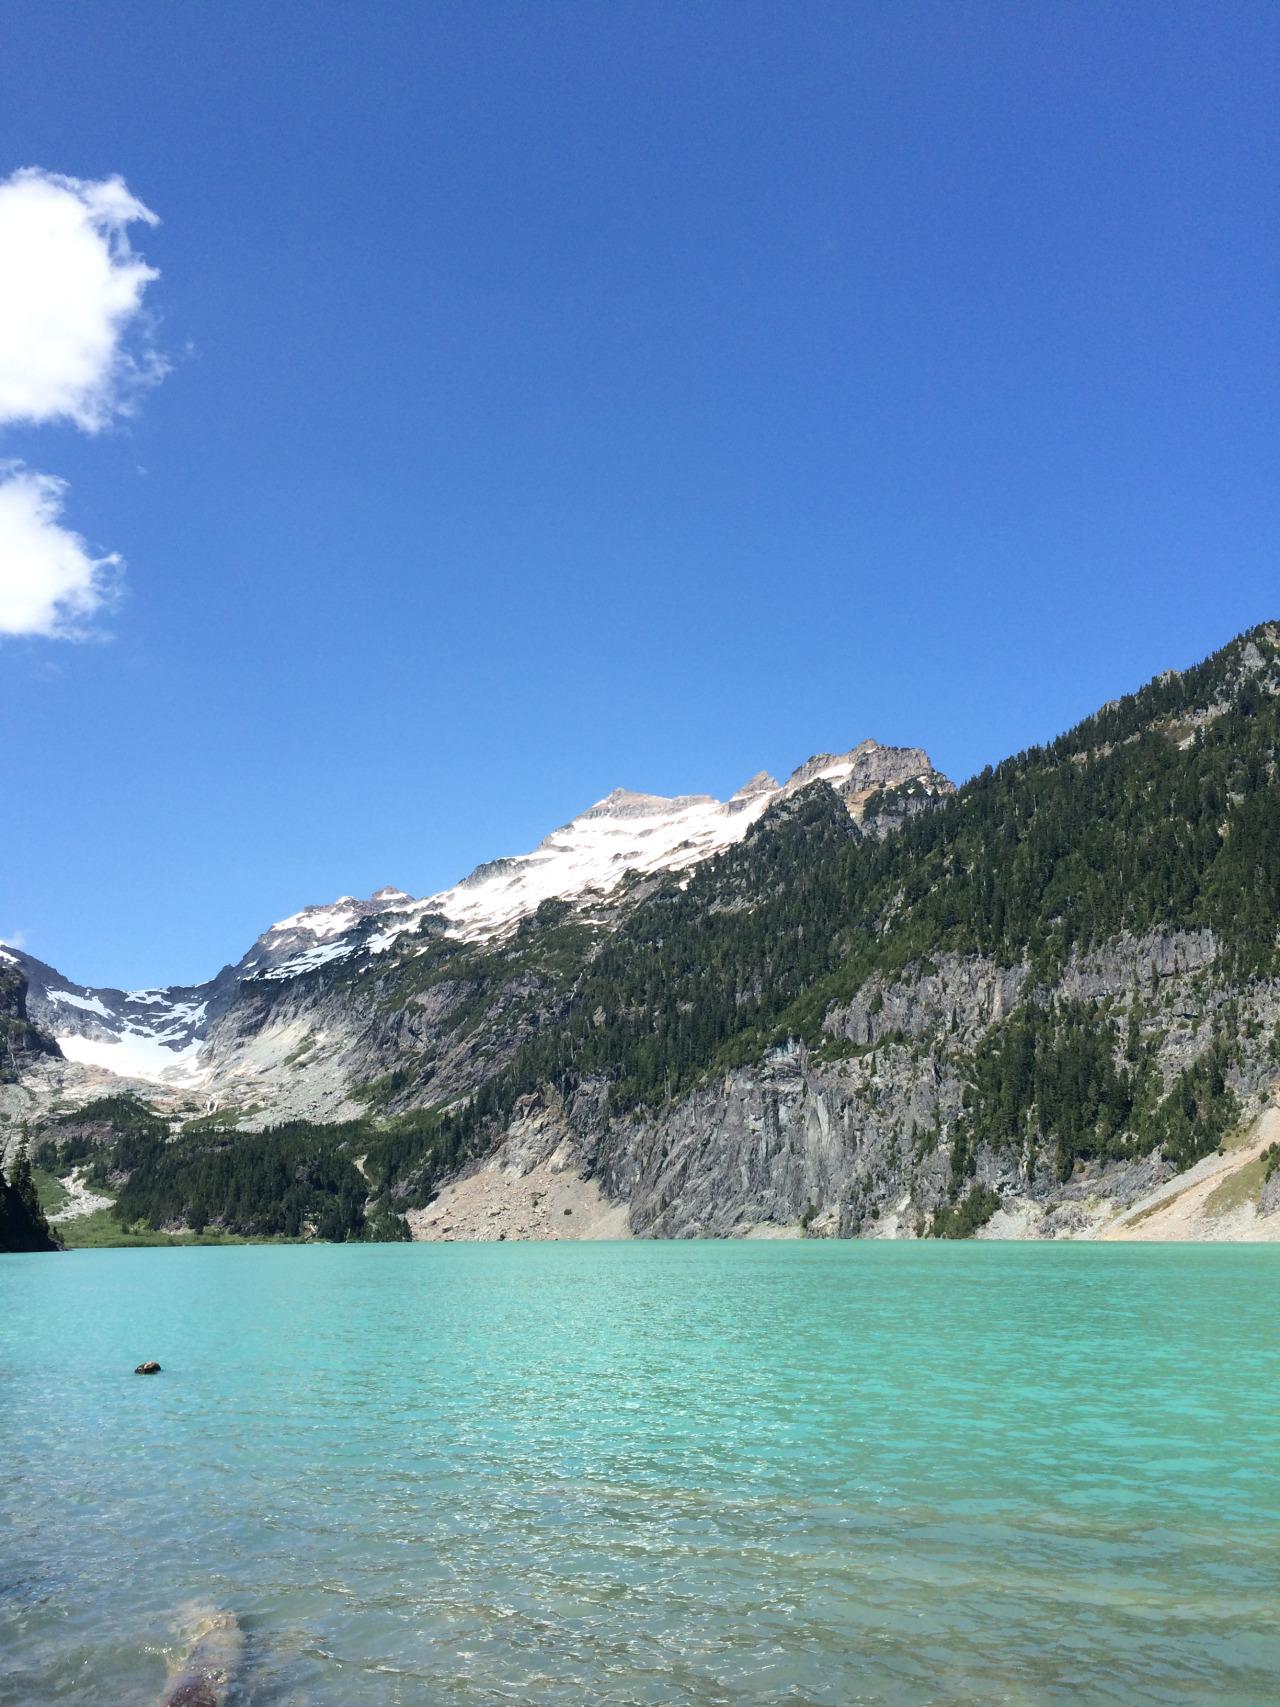 Blanca Lake, Washington  May 2015